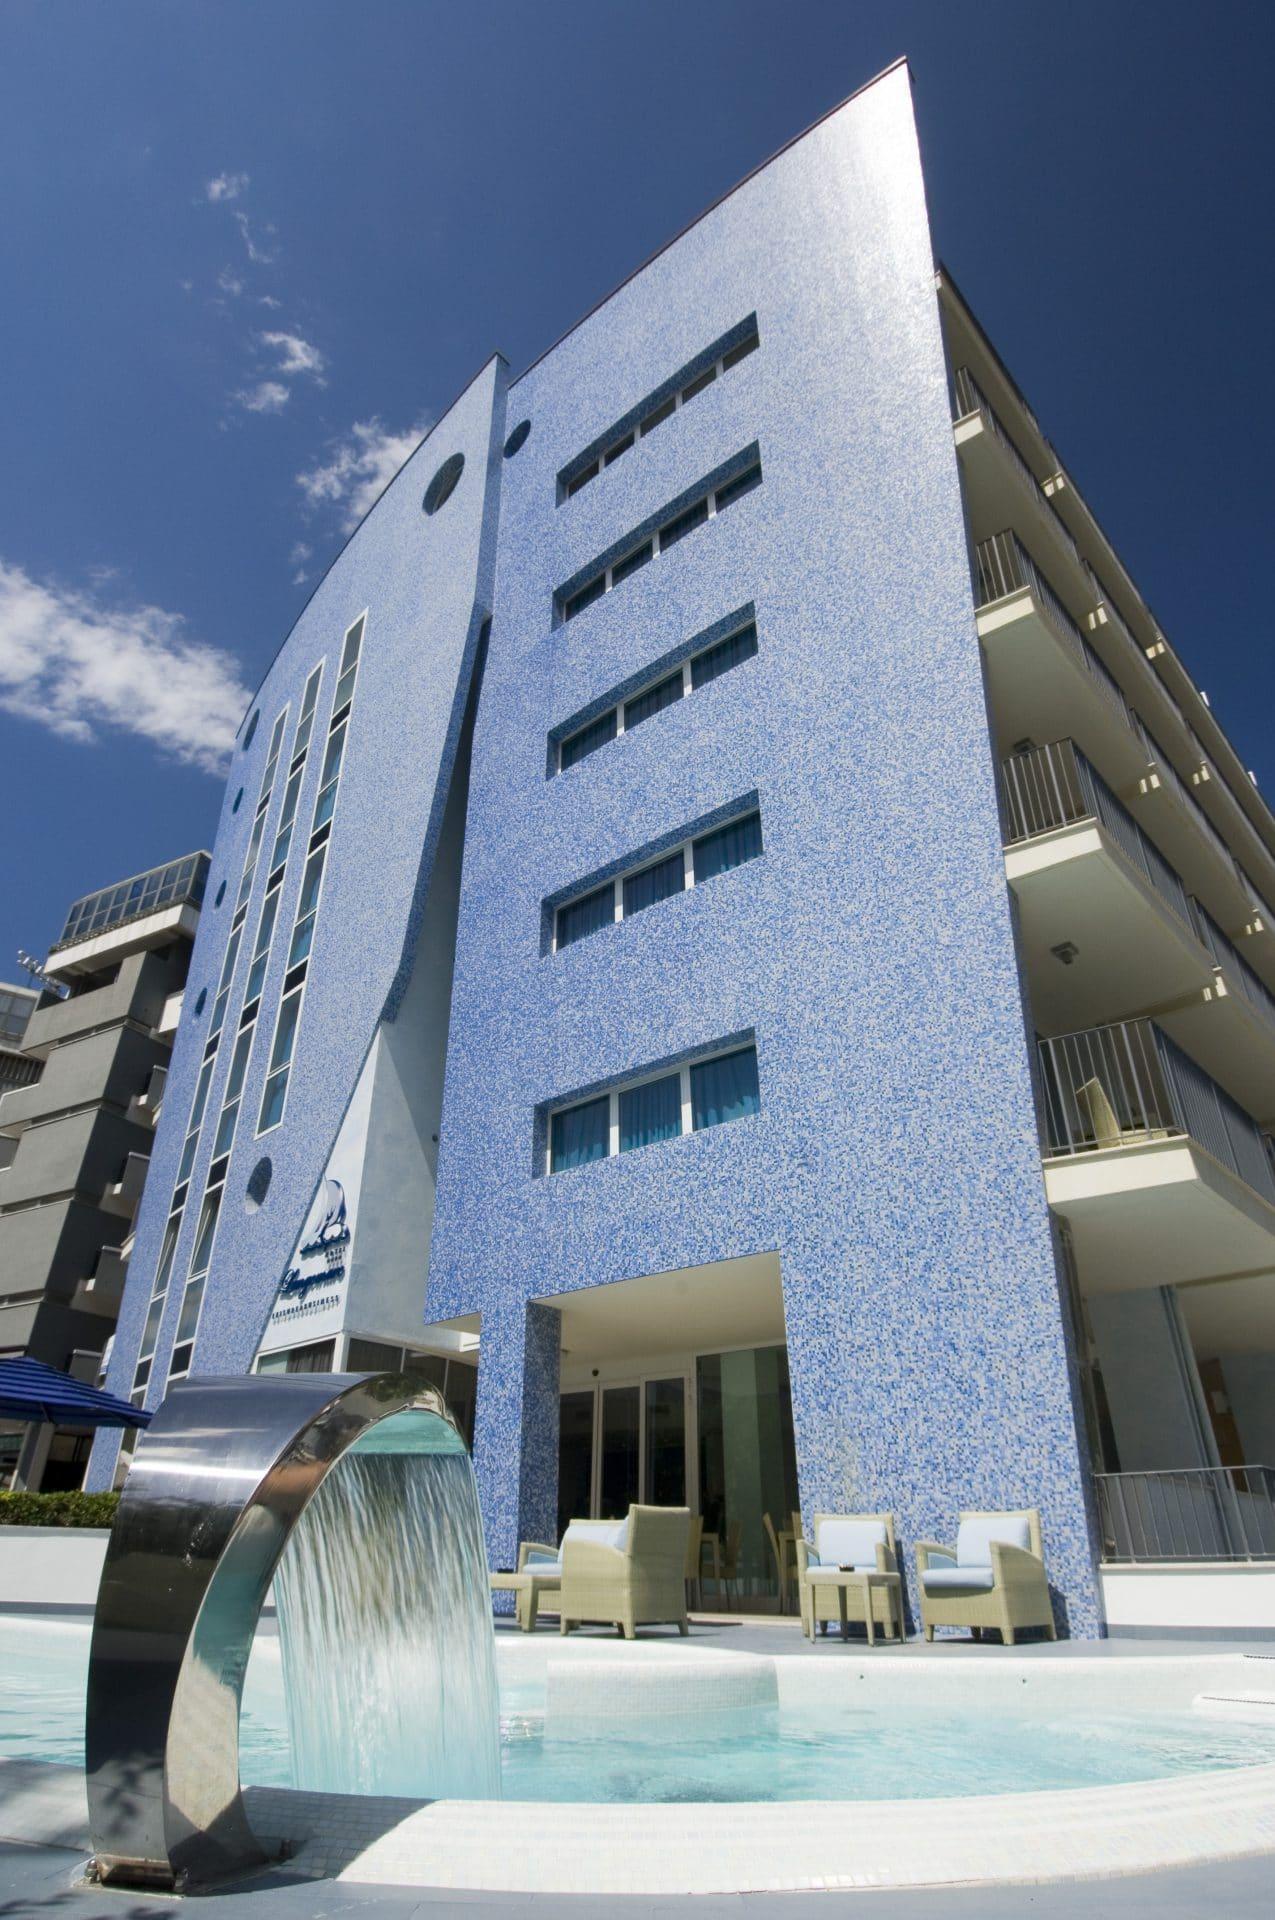 Mercure Rimini Hotel Lungomare